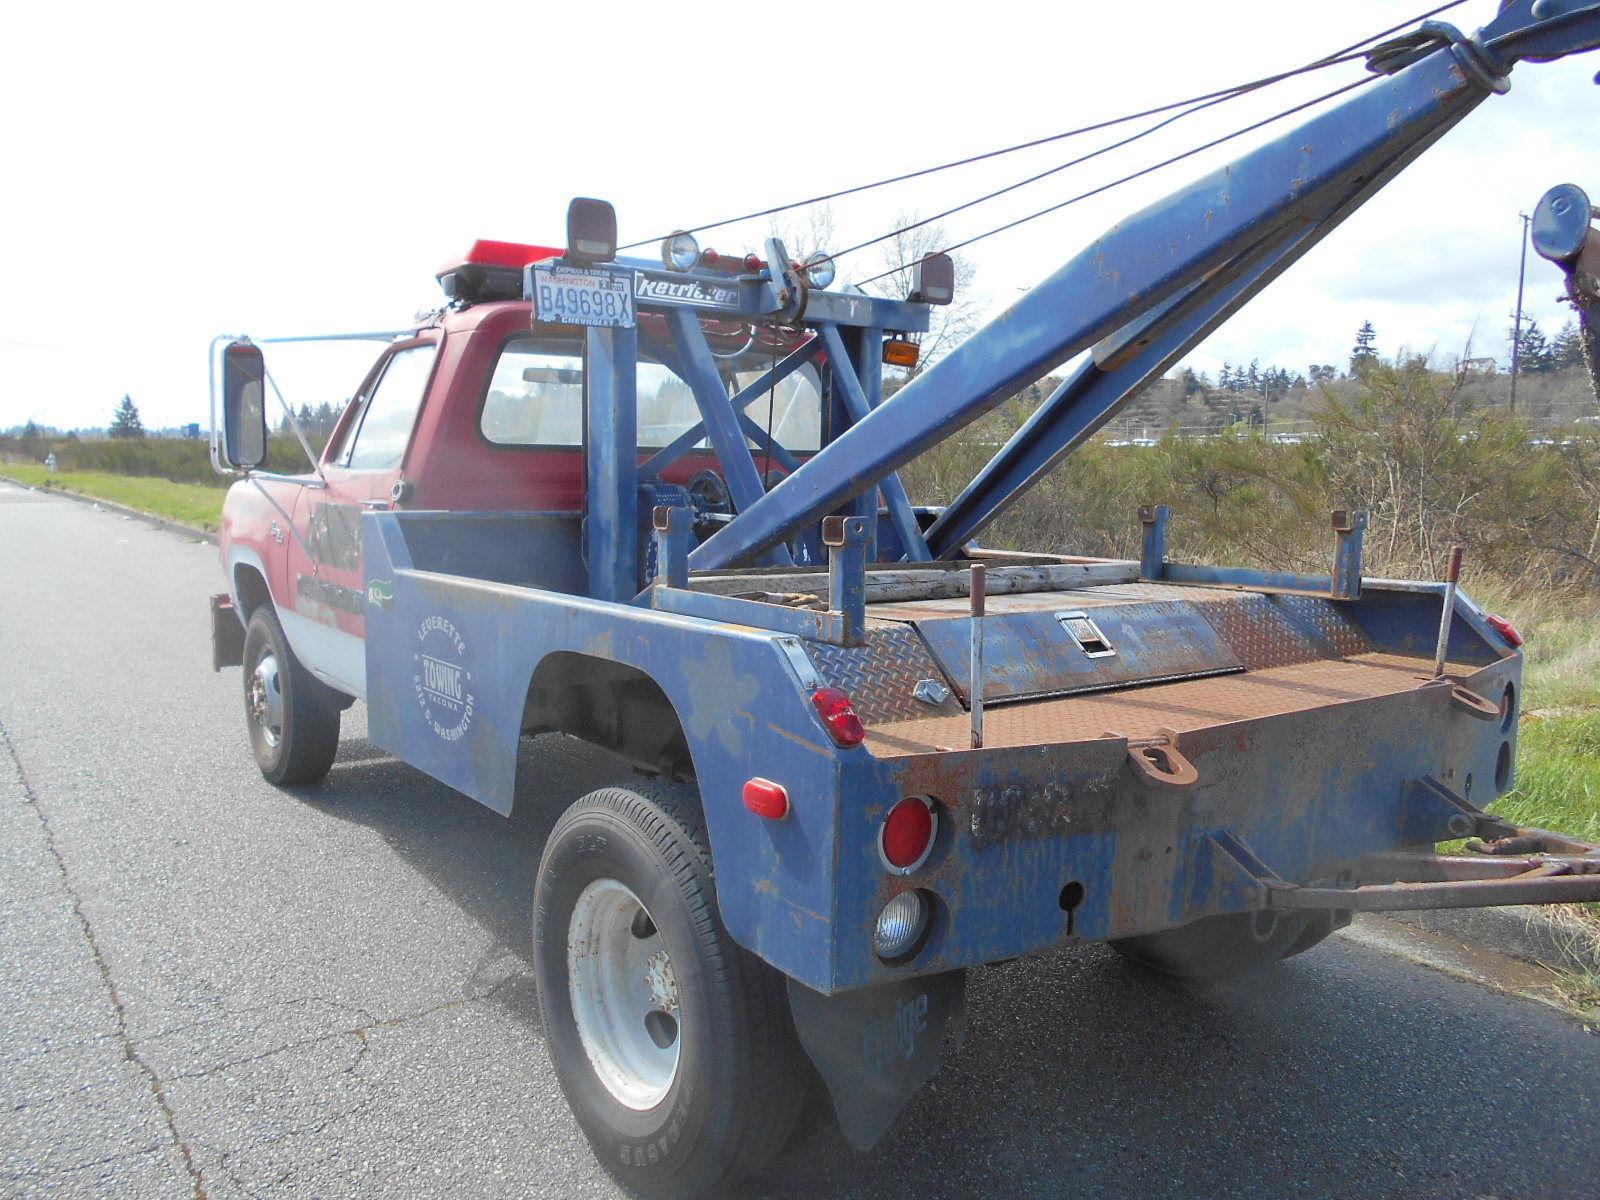 BangShift 1978 Dodge Power Wagon Tow Truck